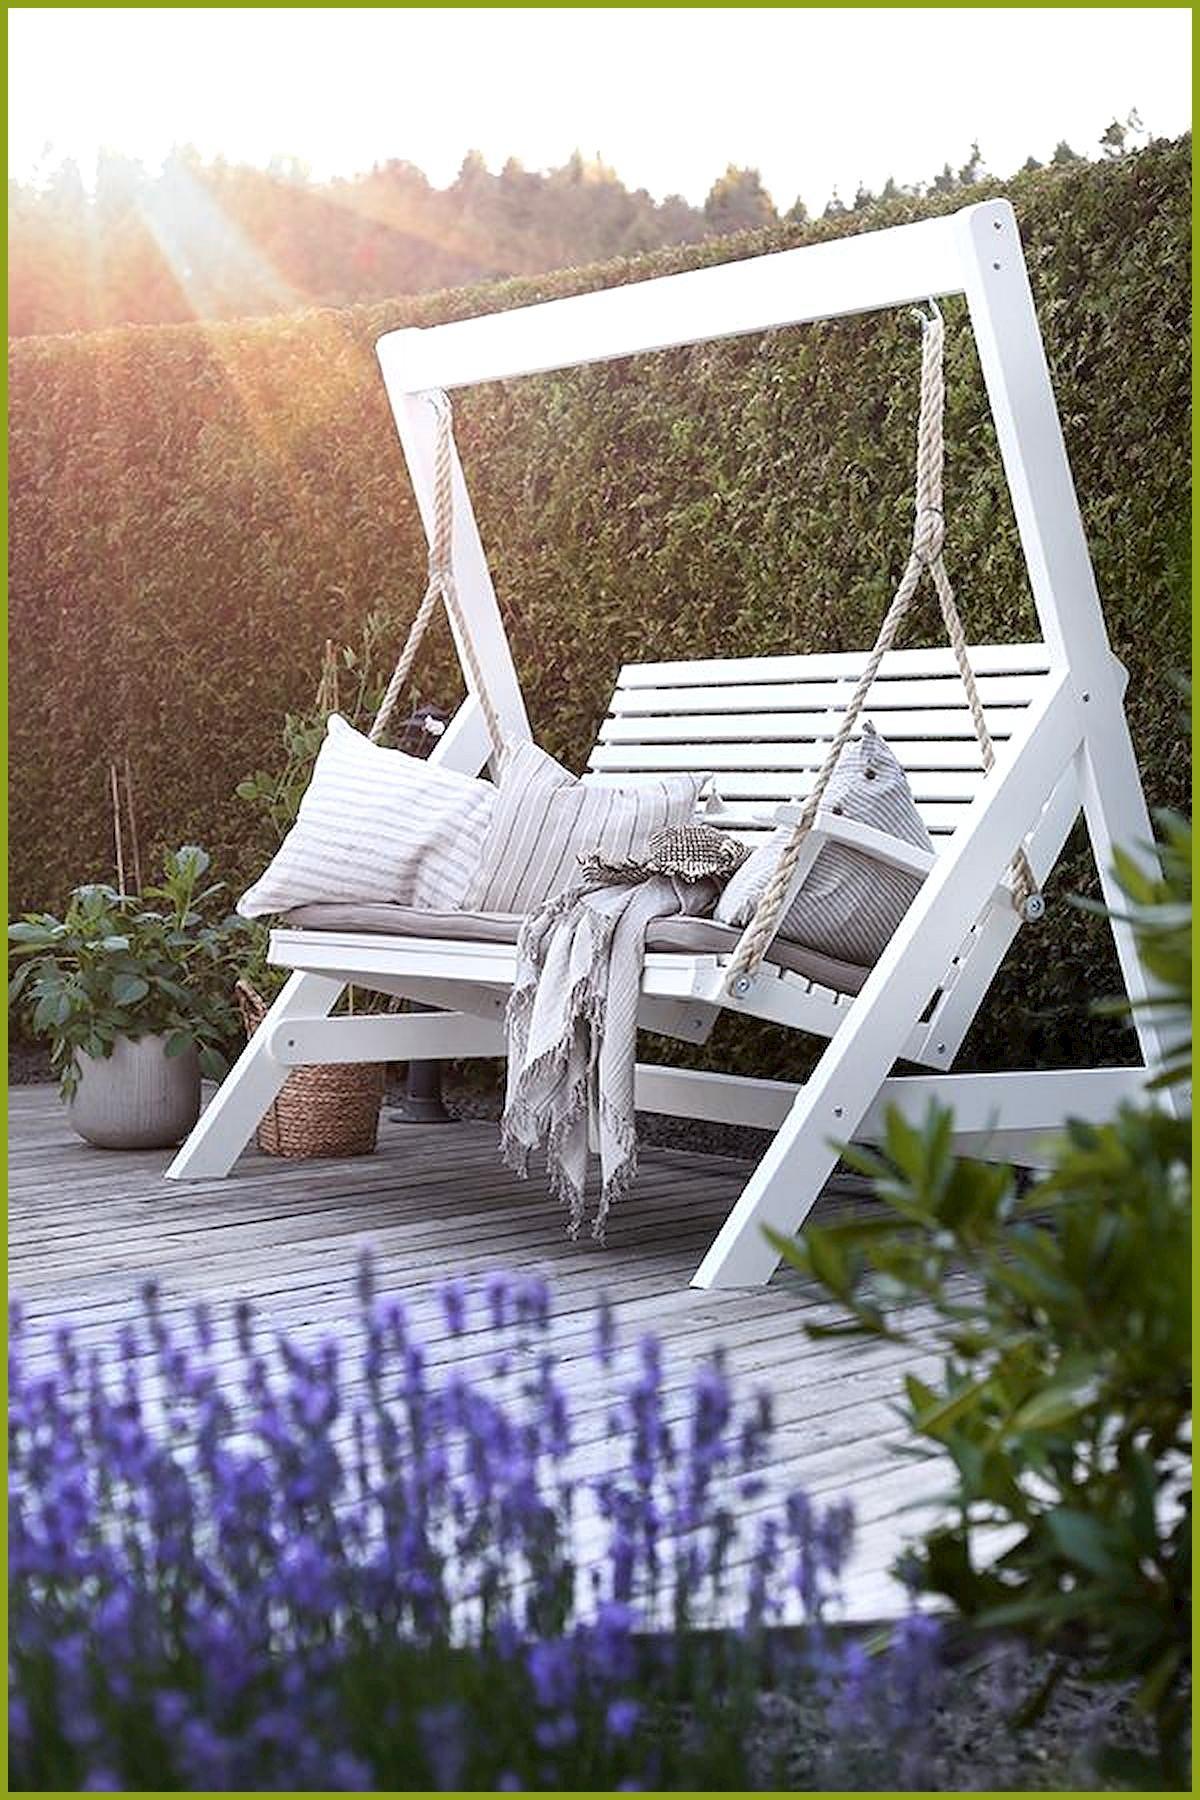 porch swings in 2020 diy garden furniture garden on porch swing ideas inspiration id=68626